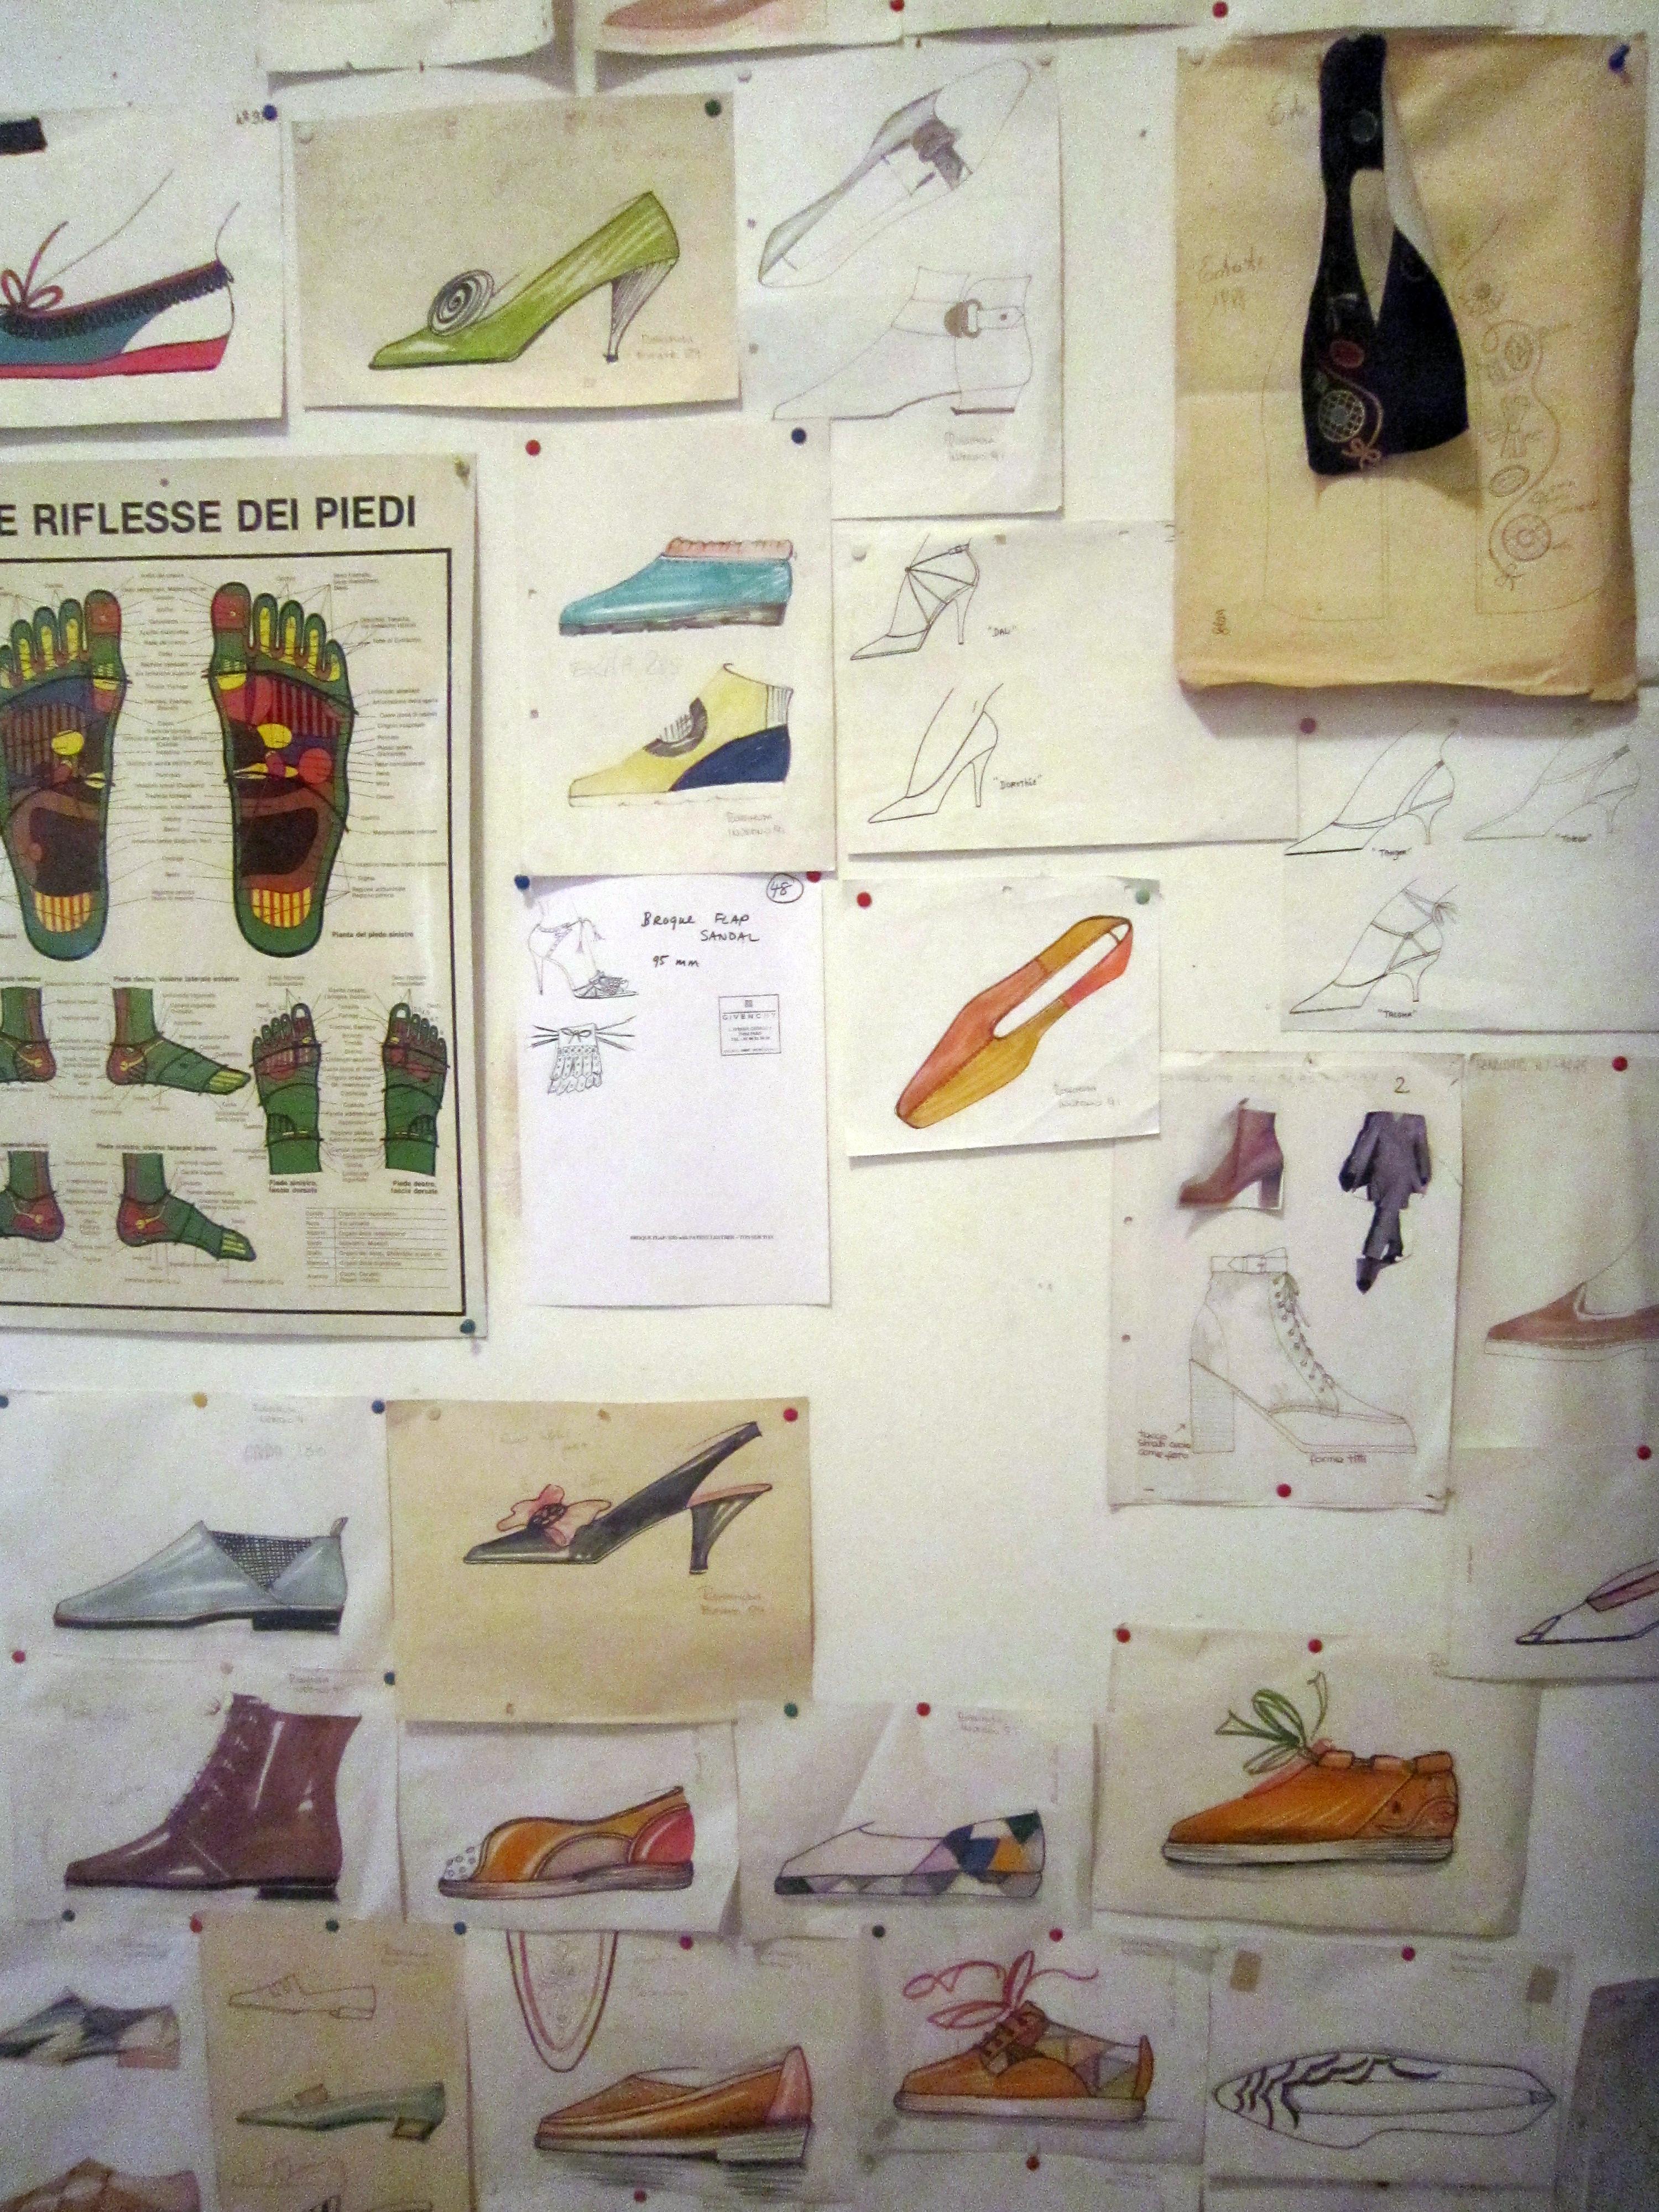 Bozzetti di scarpe